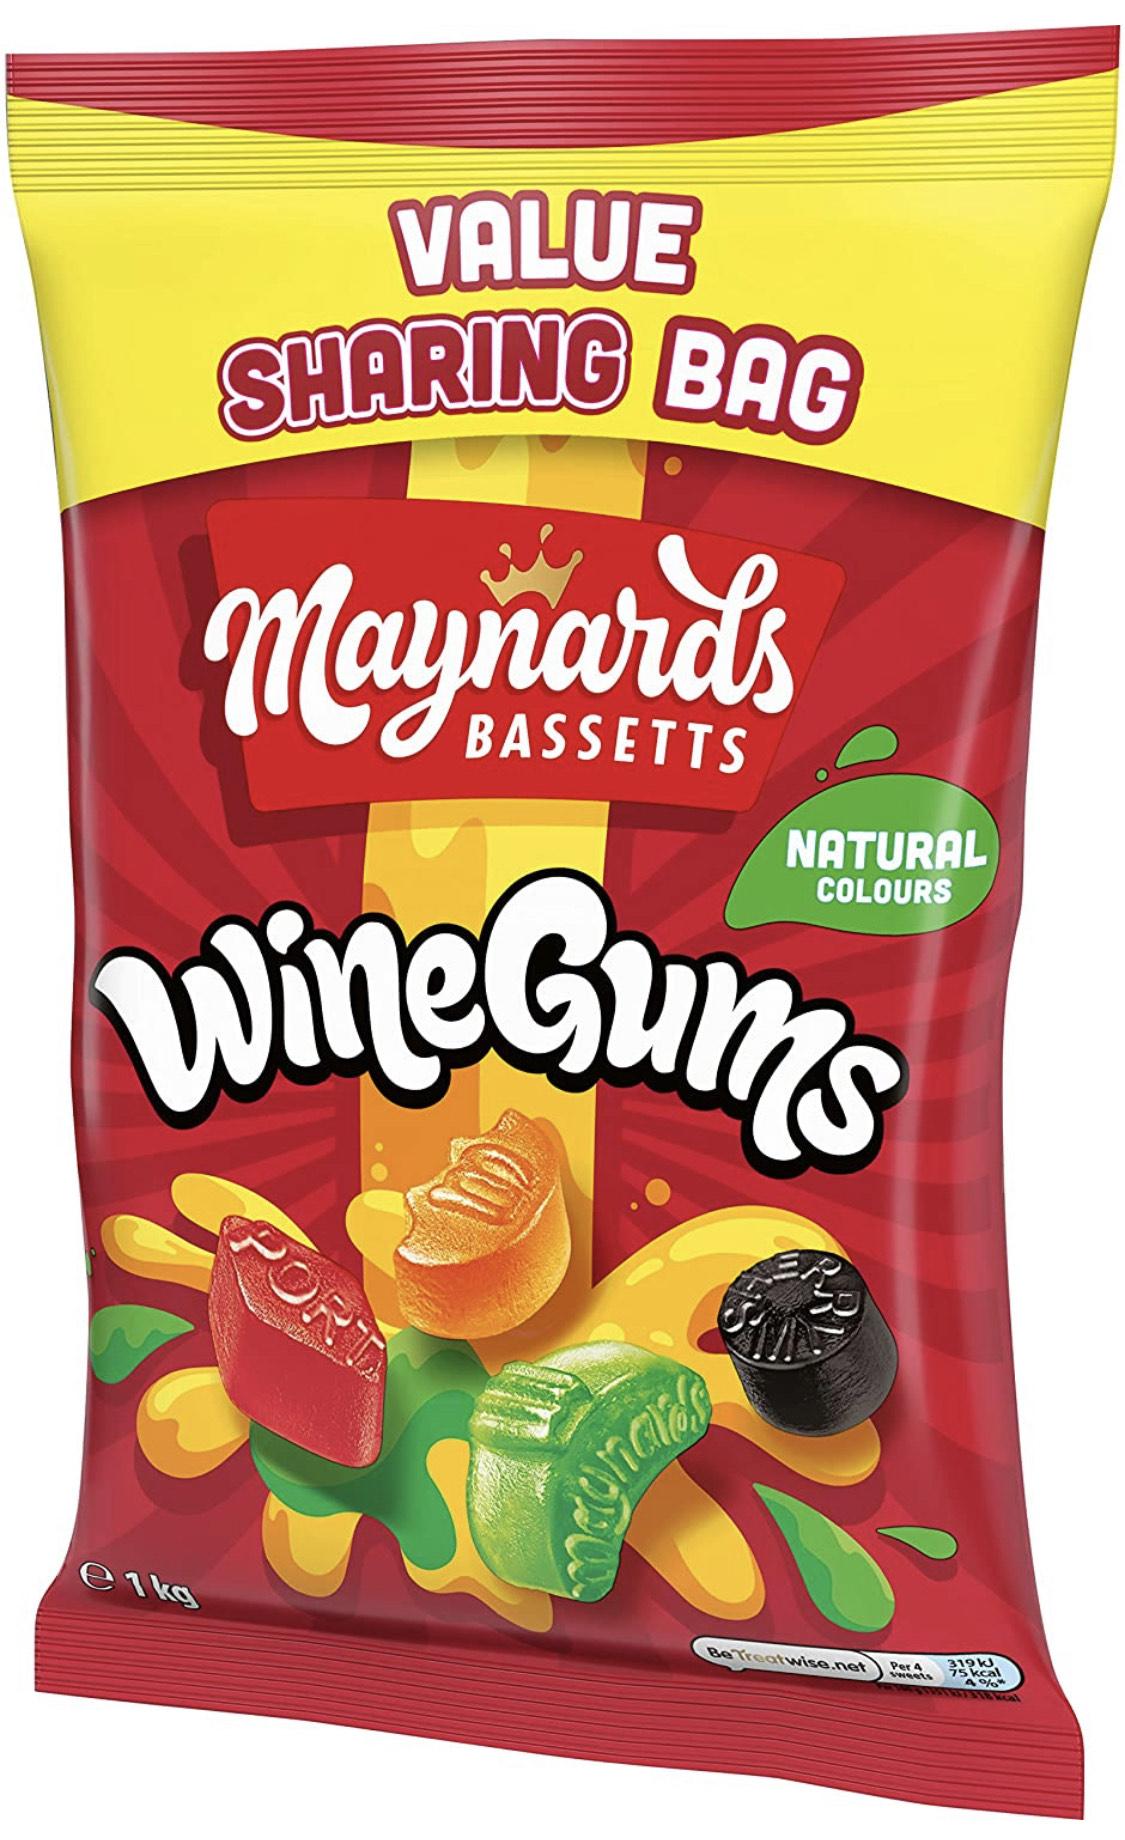 Maynards Bassetts Wine Gums Giant Sweets Sharing Bag 1 kg - £5 (+£4.49 Non Prime) at Amazon